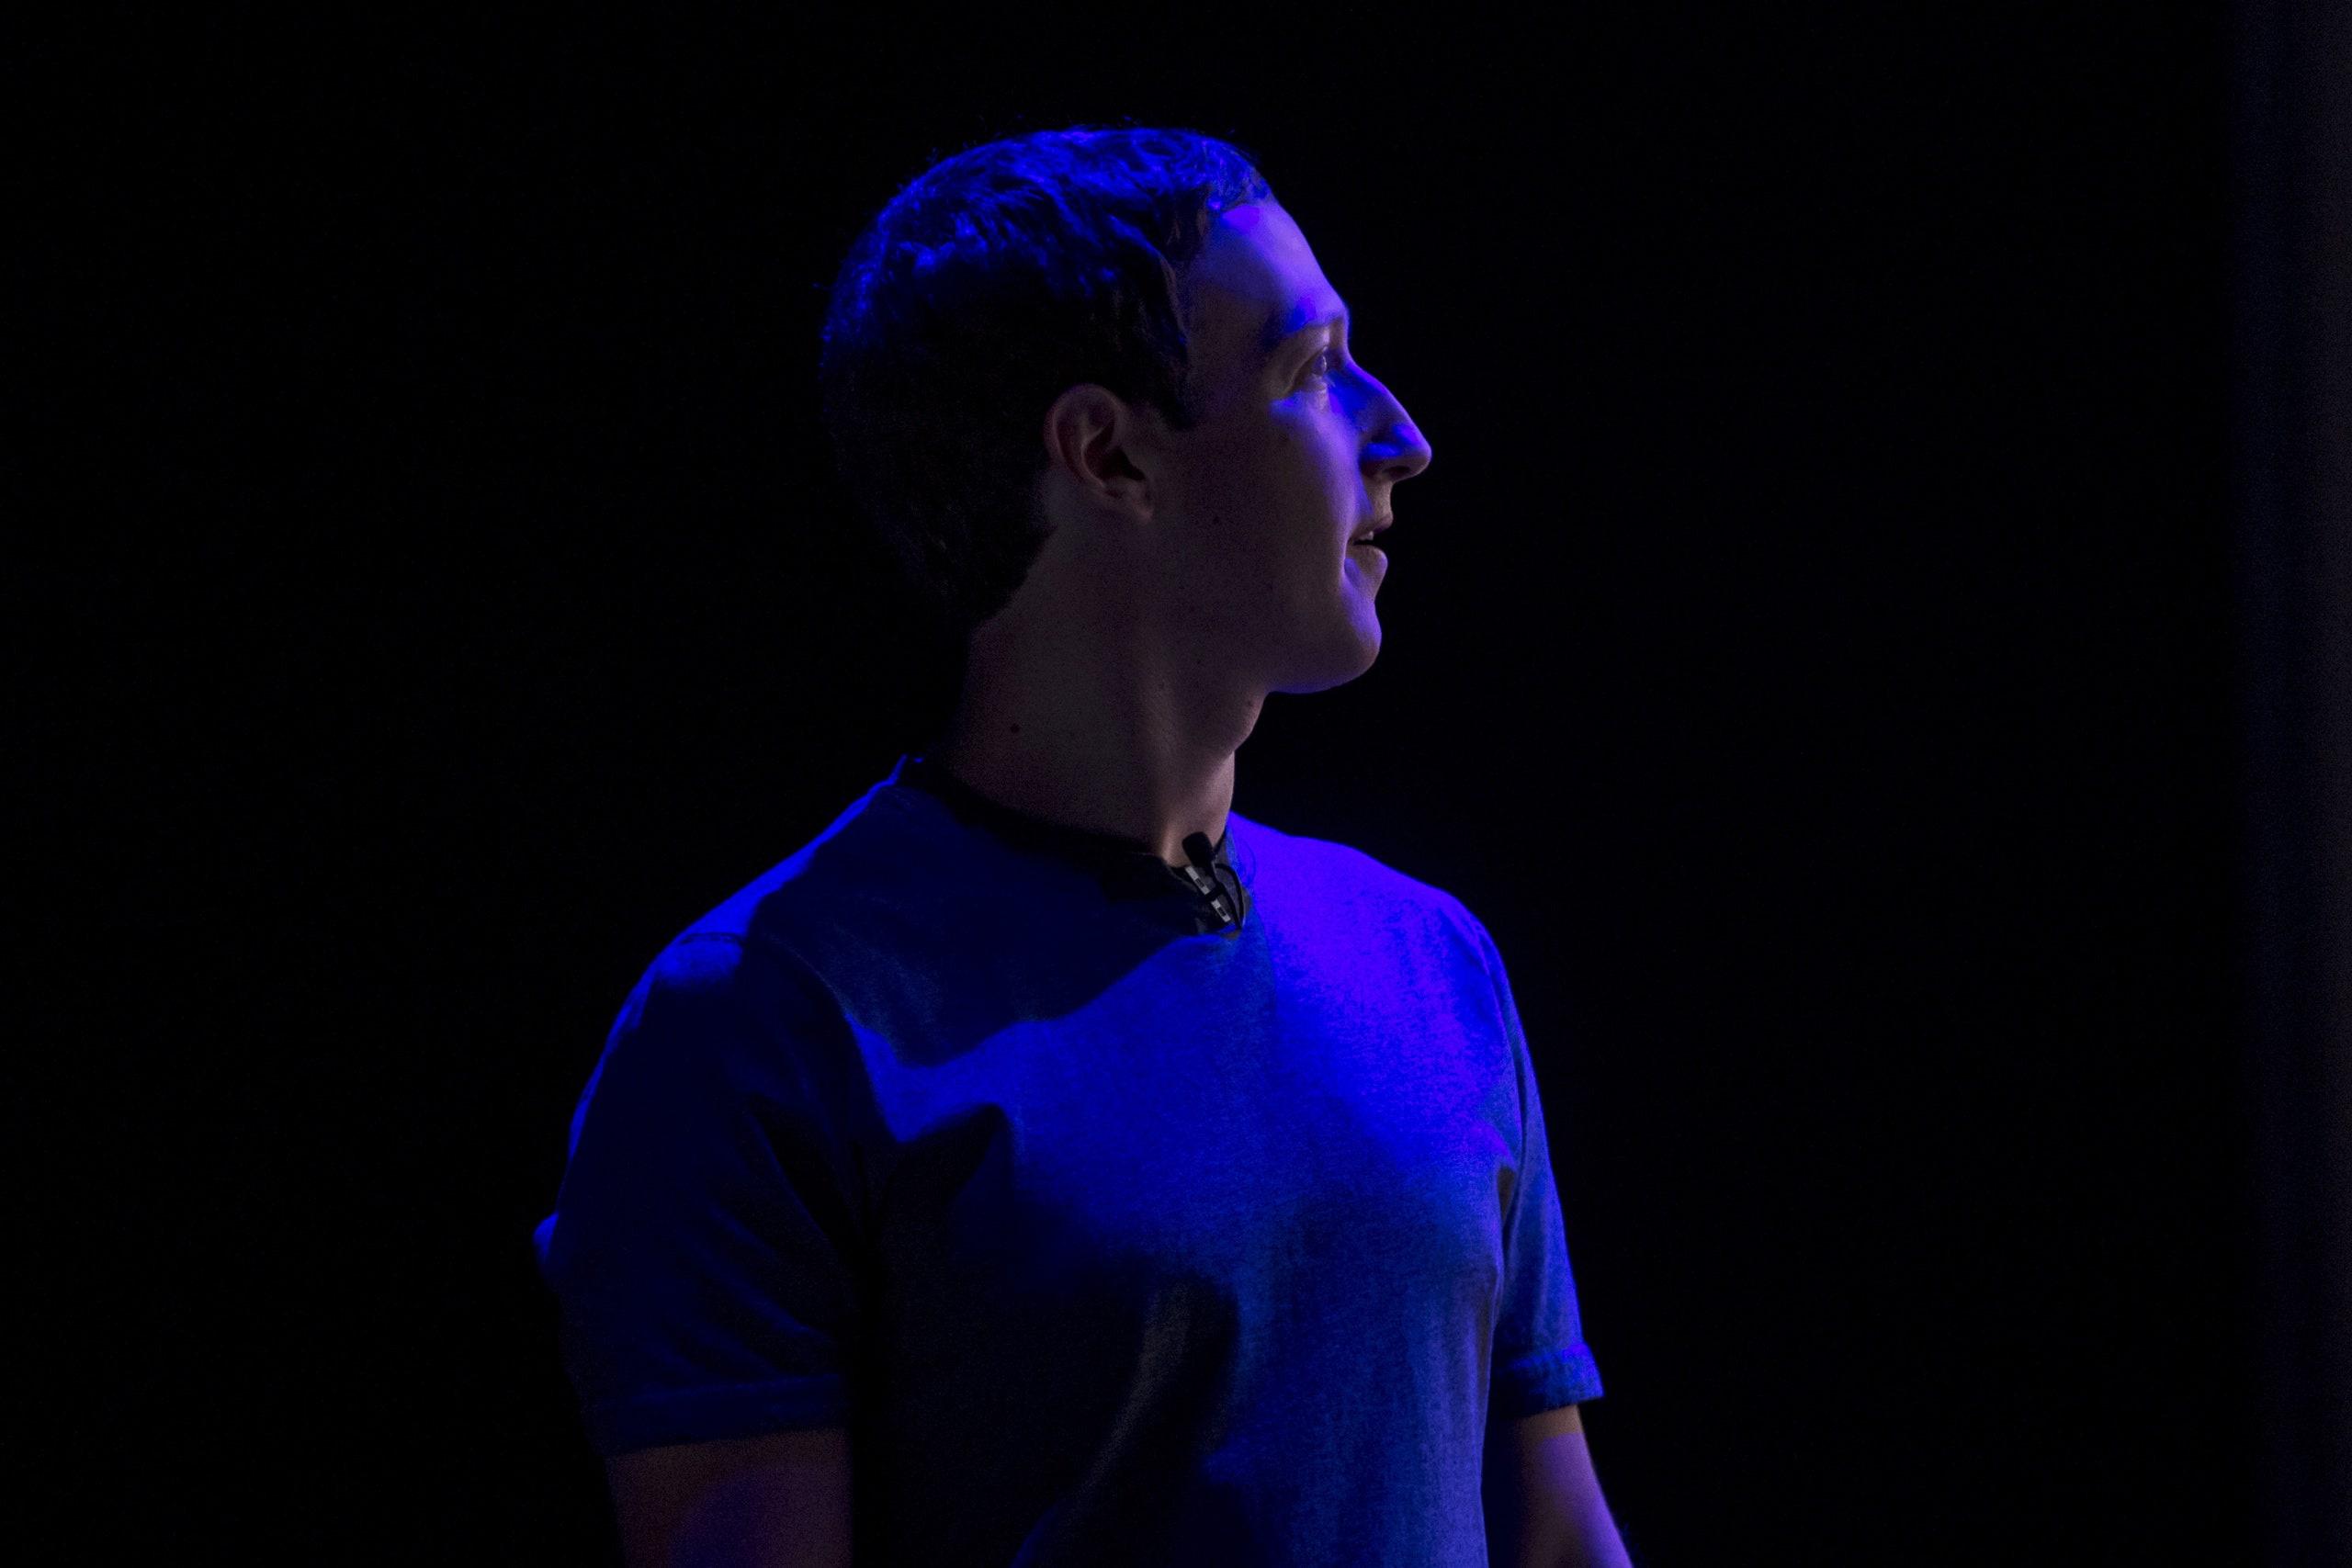 Facebook khong the sua sai neu khong nhan sai anh 1